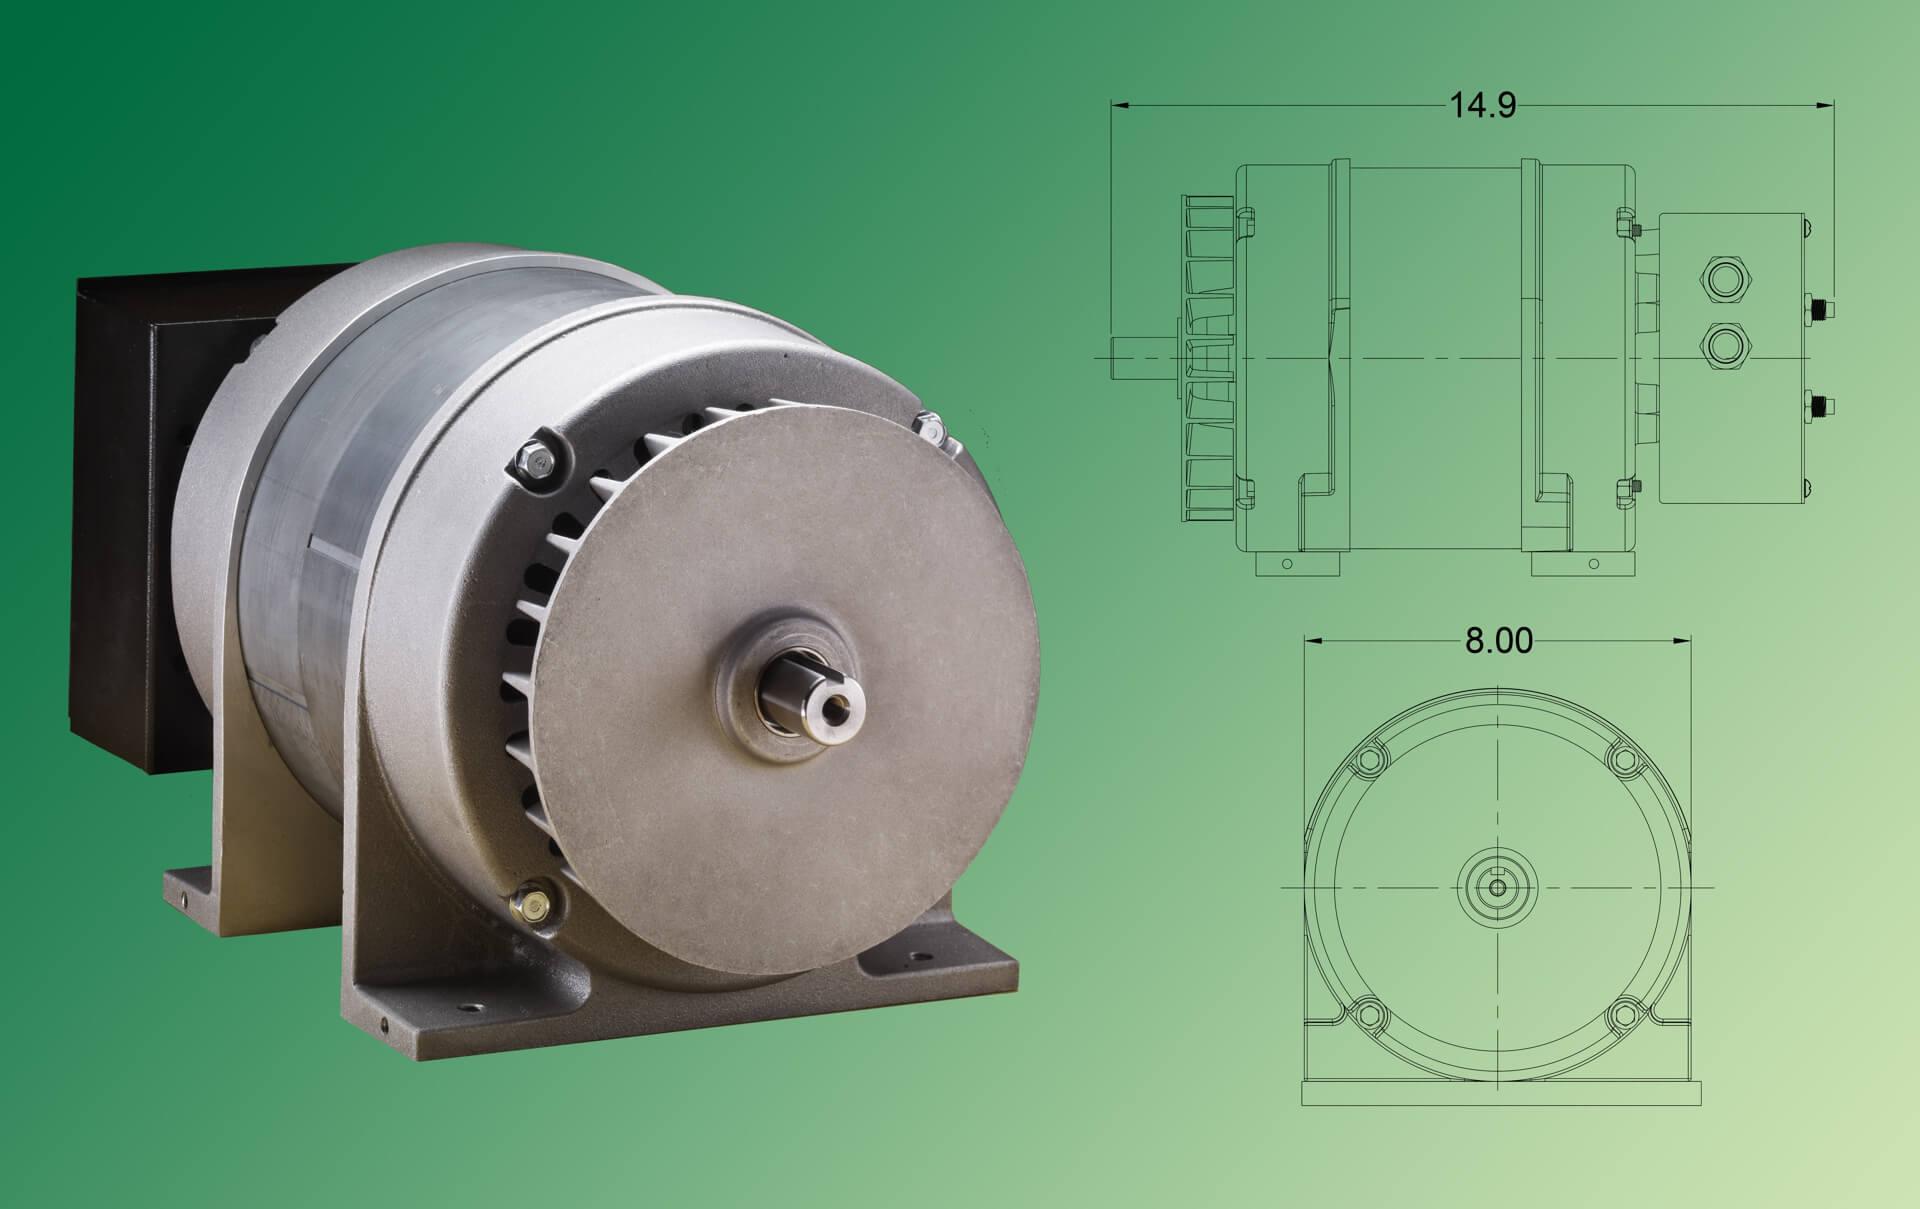 hight resolution of rigmaster apu wiring diagram ac generator wiring libraryreplacement for rigmaster apu generator head class h